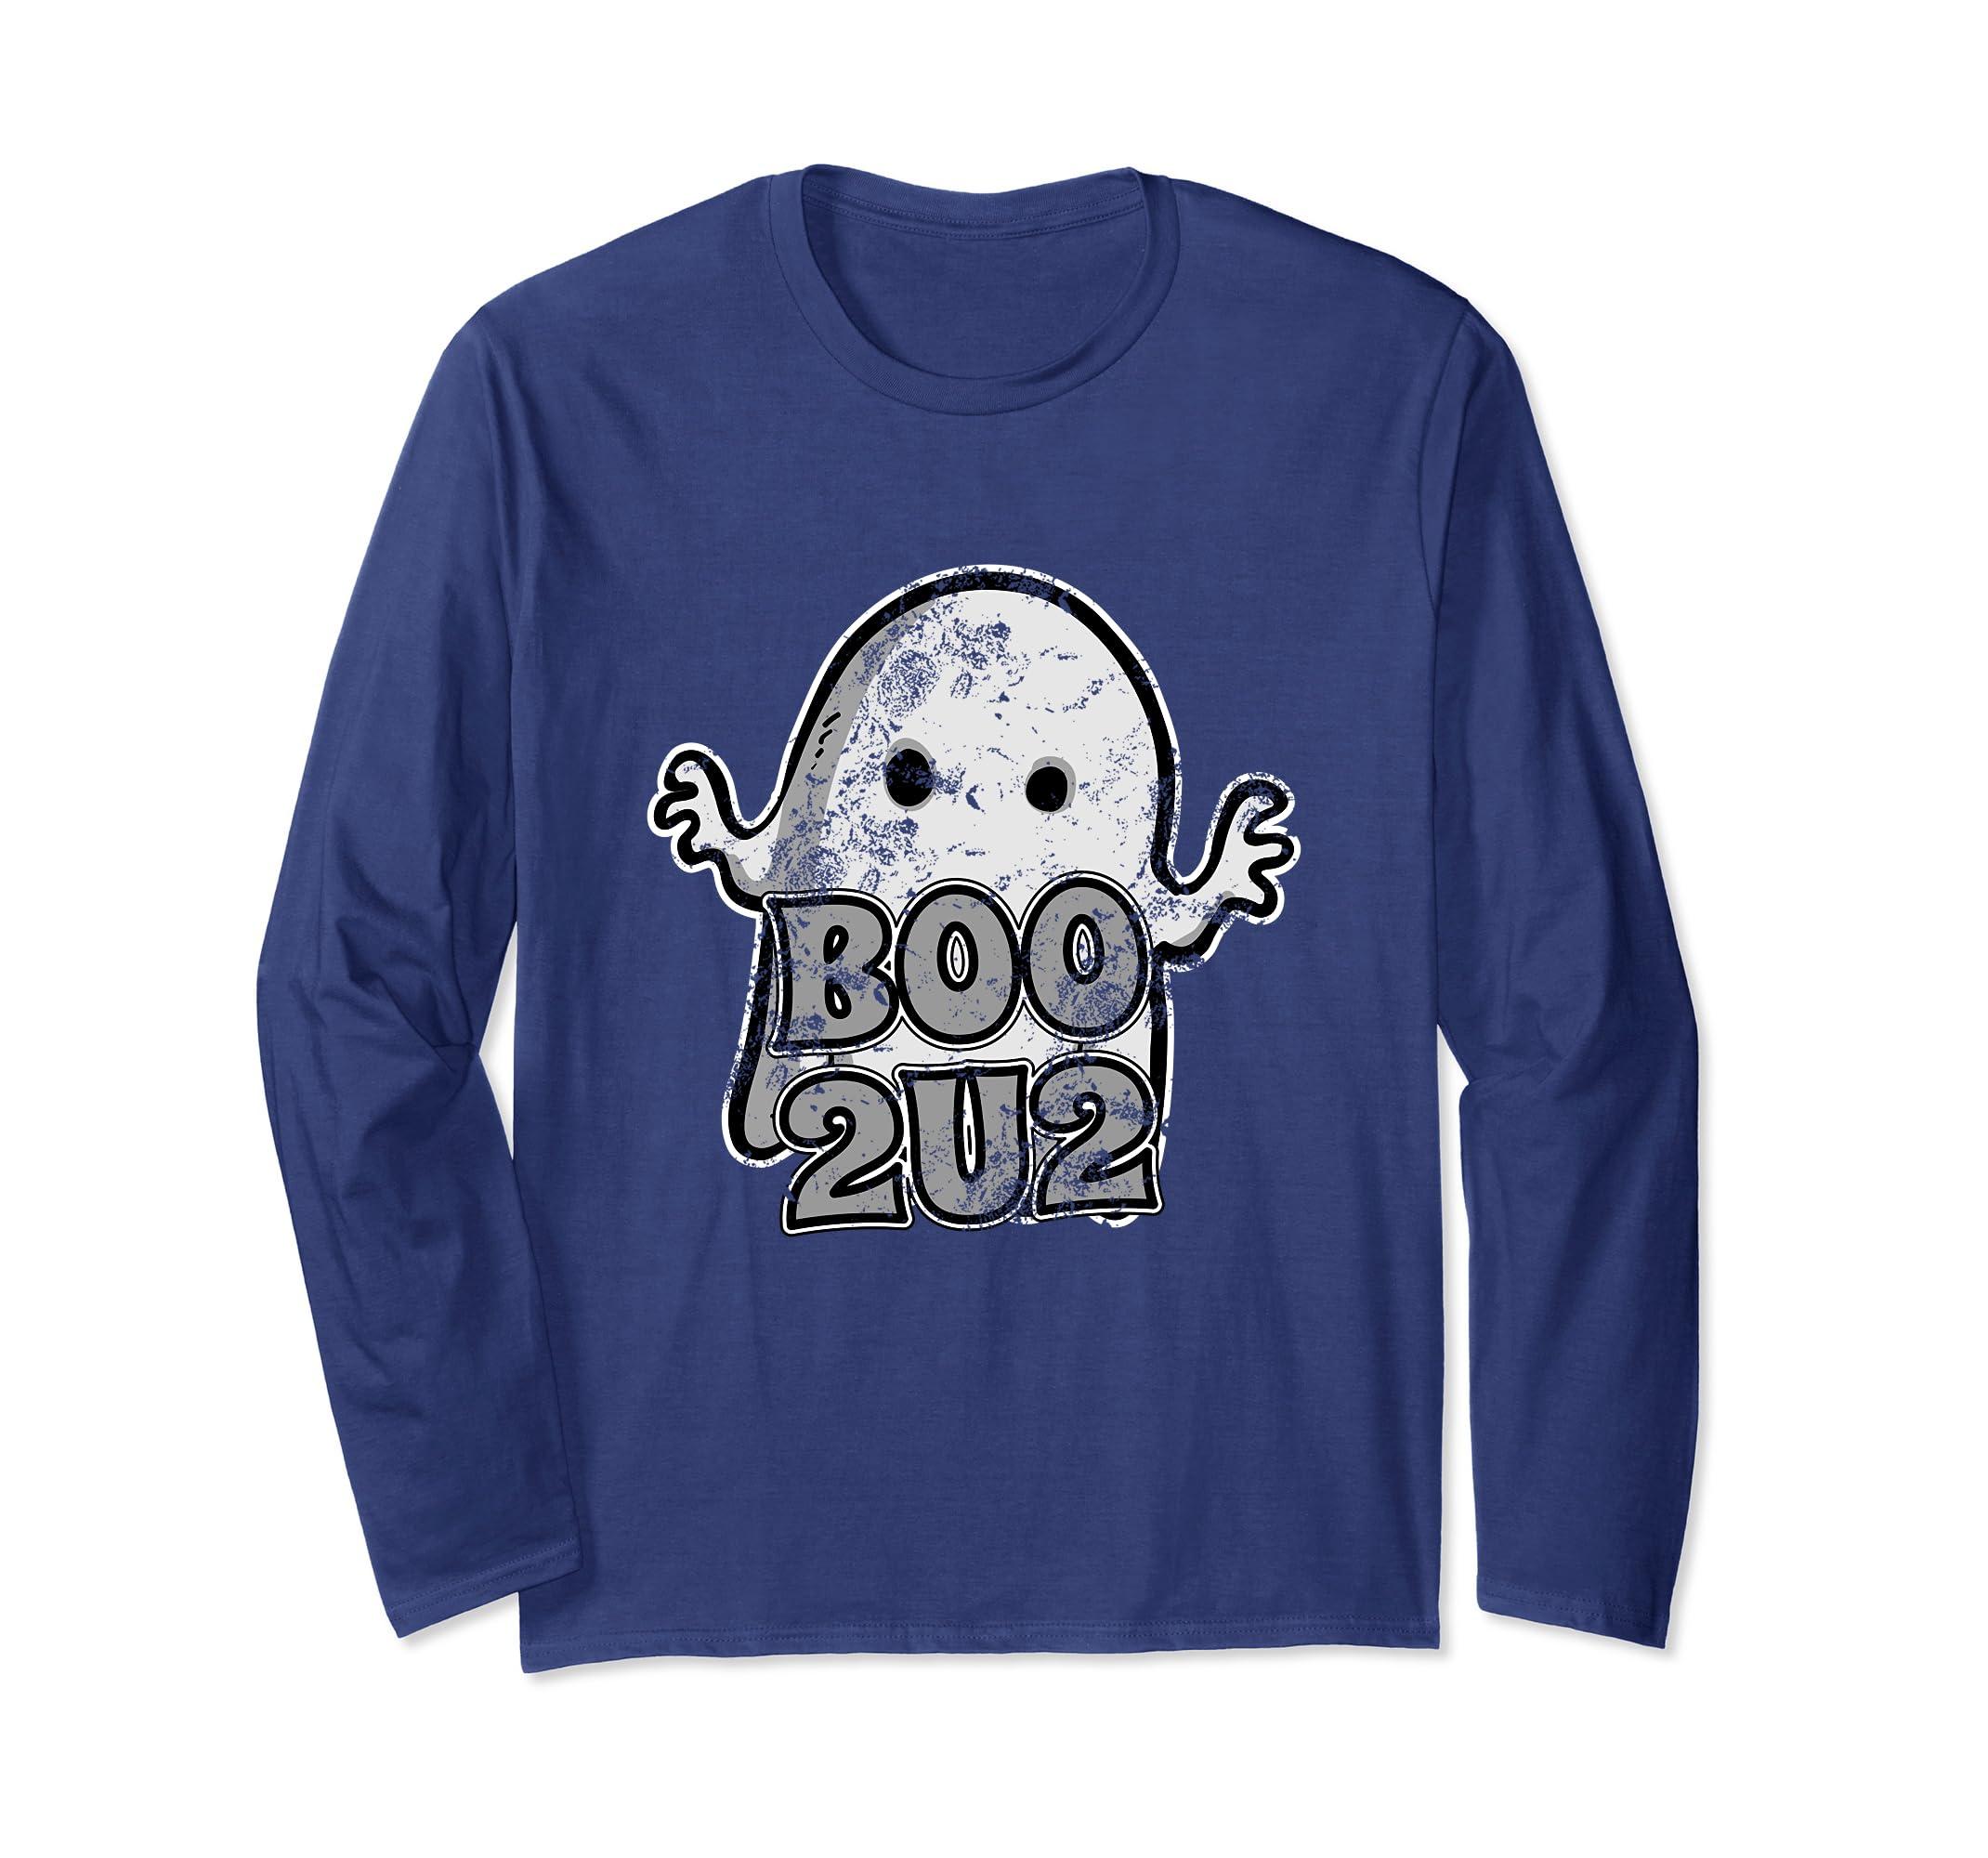 Boo 2U2-Cute Ghost Halloween Party Long Sleeve Shirt-Rose